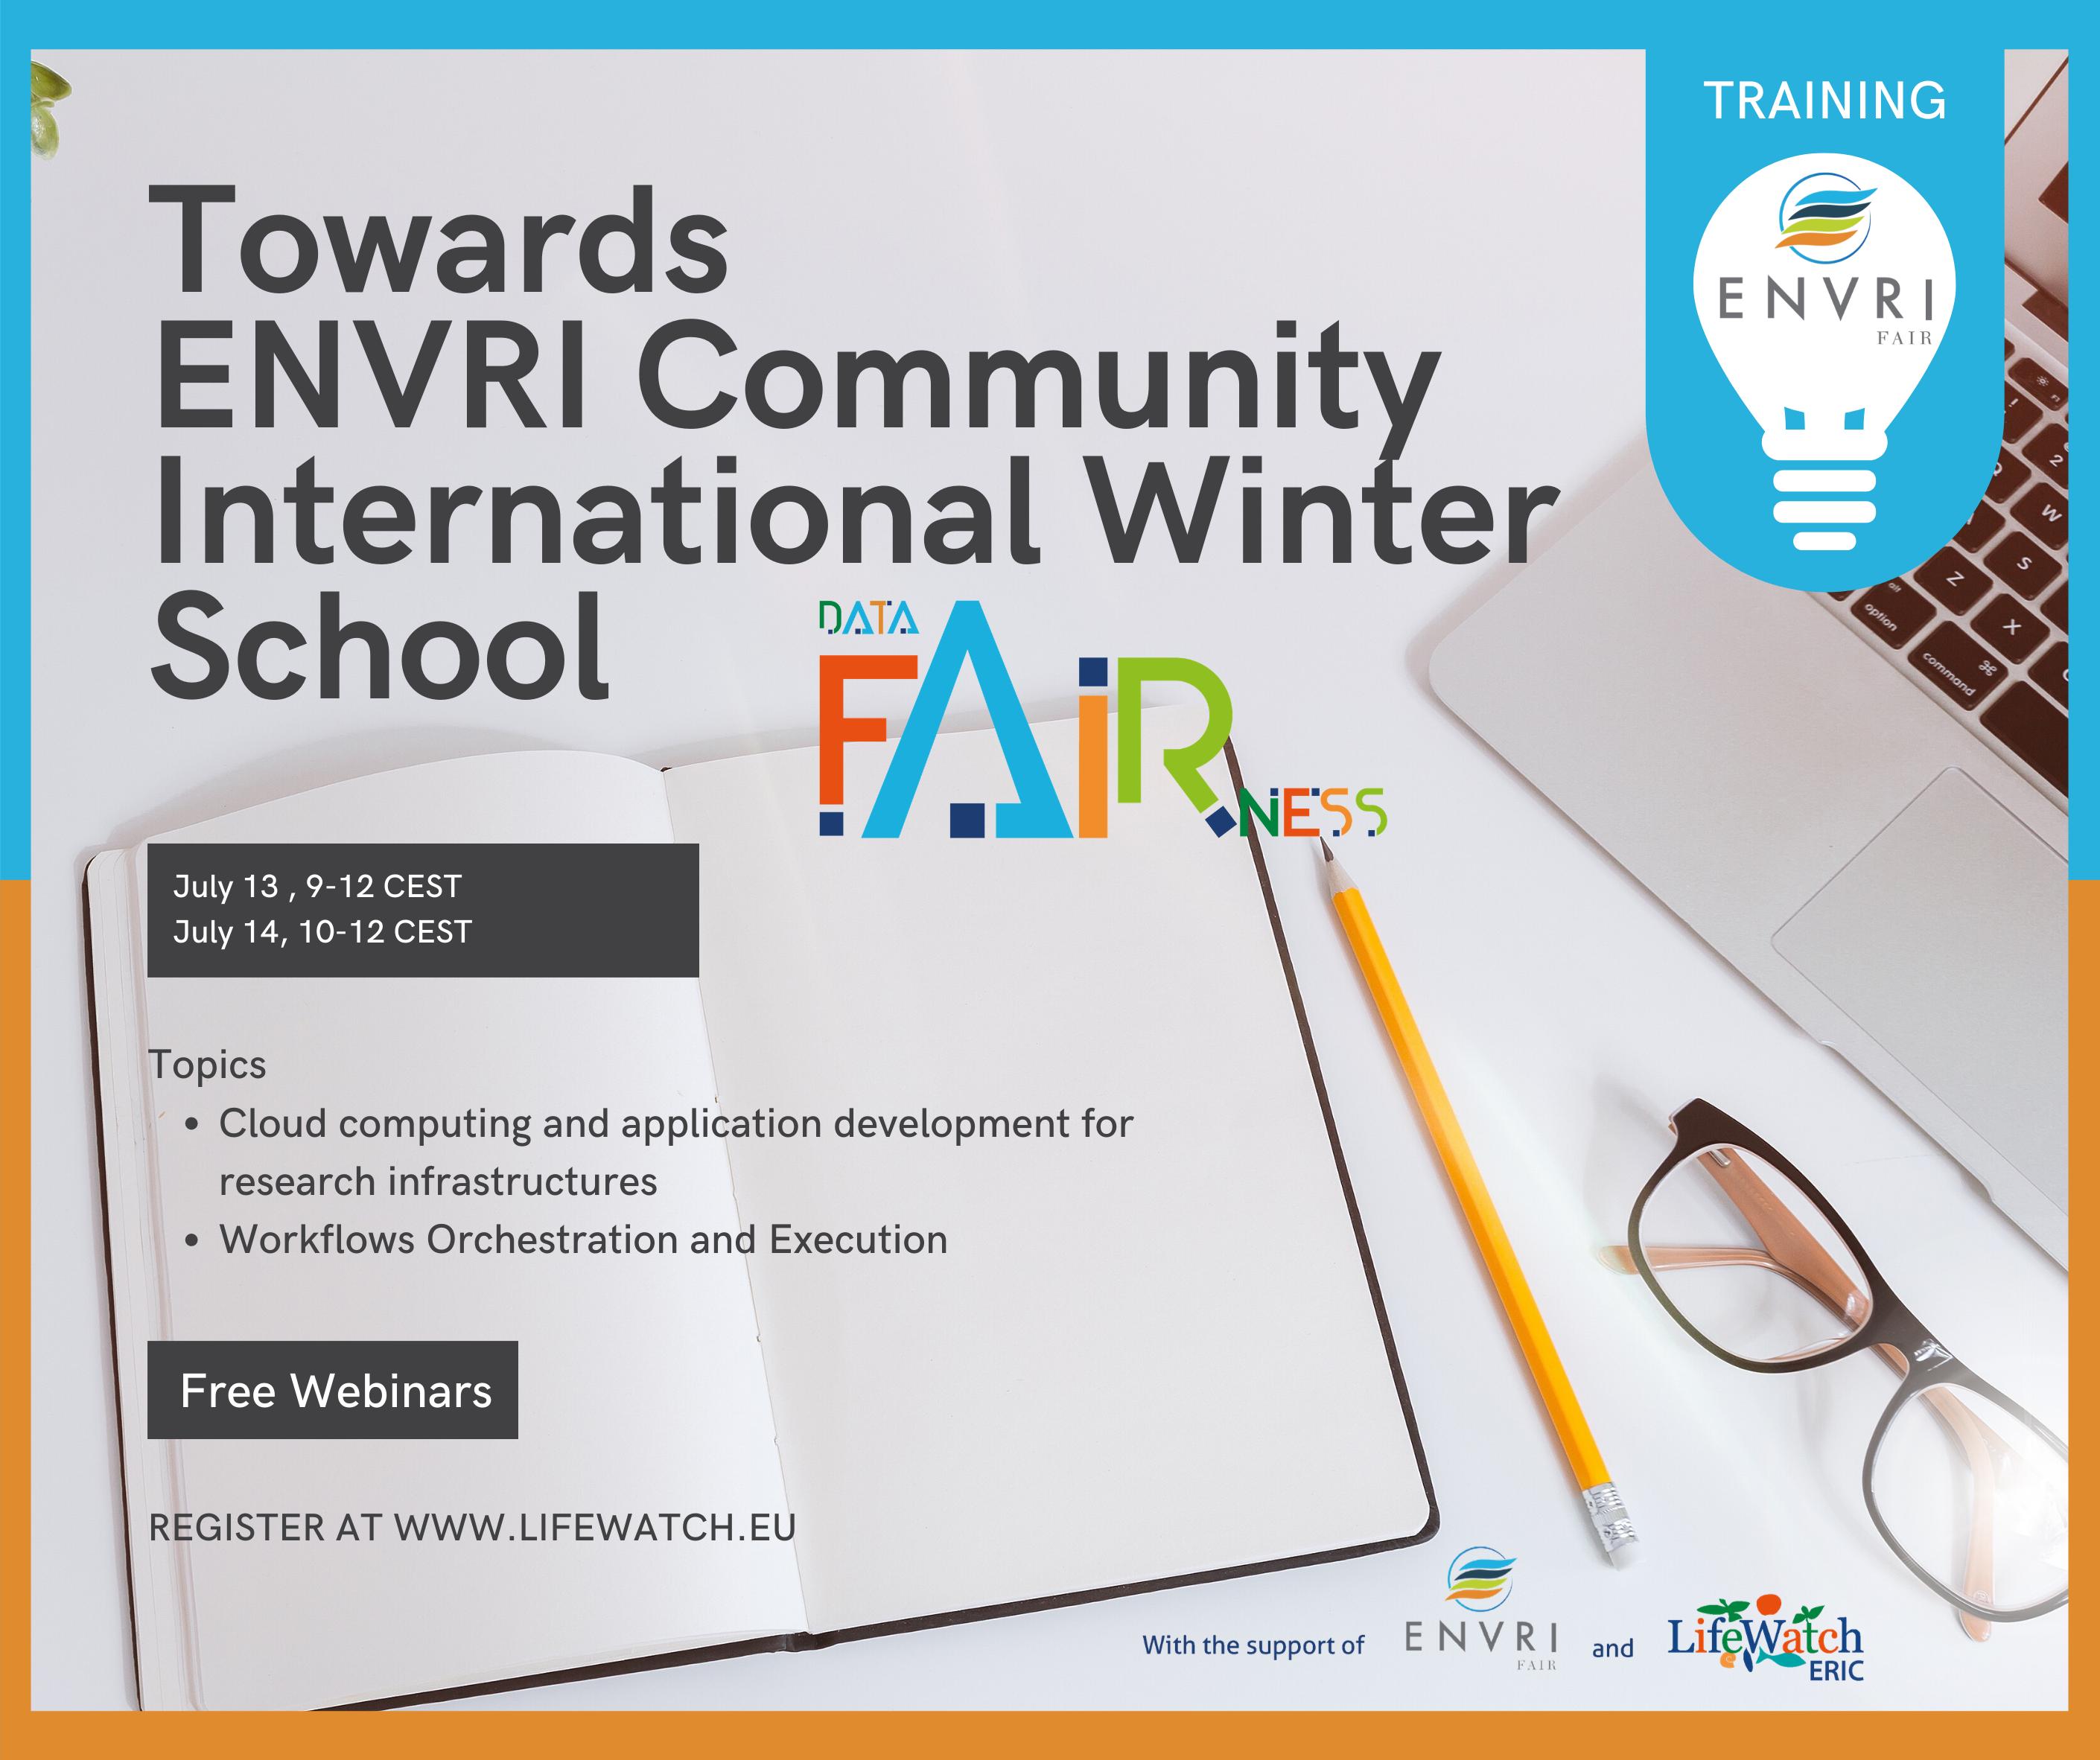 Towards ENVRI Community International Winter School webinar banner